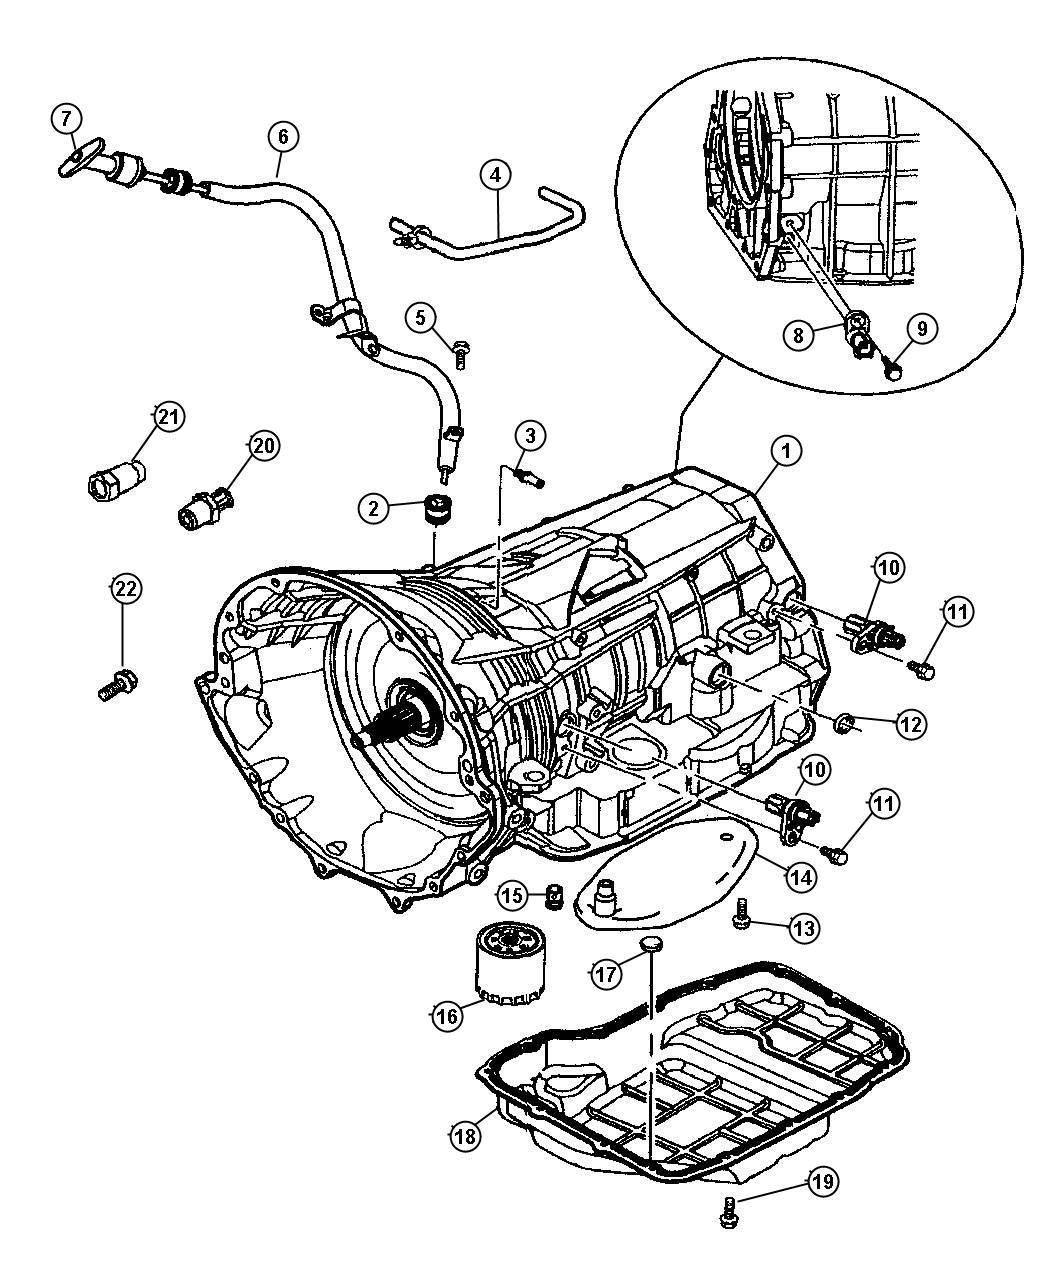 Dodge Durango Case Package Transmission Includes